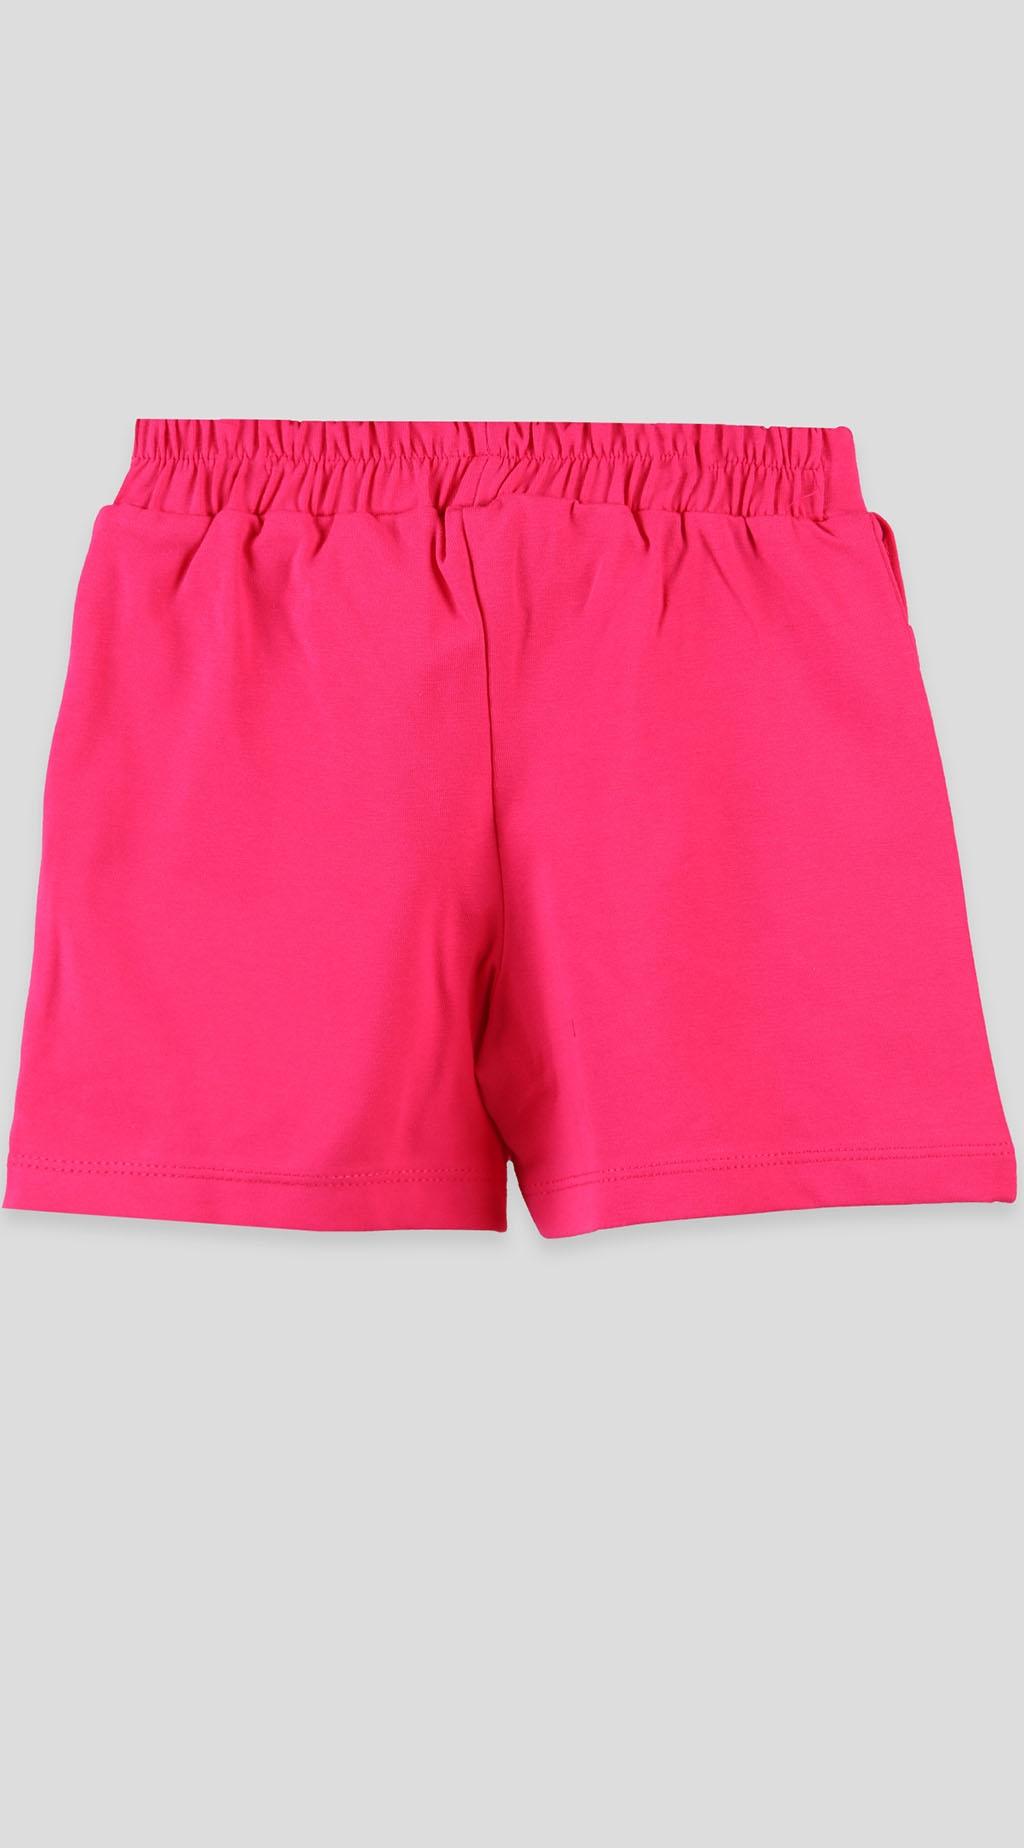 Пола - панталонки